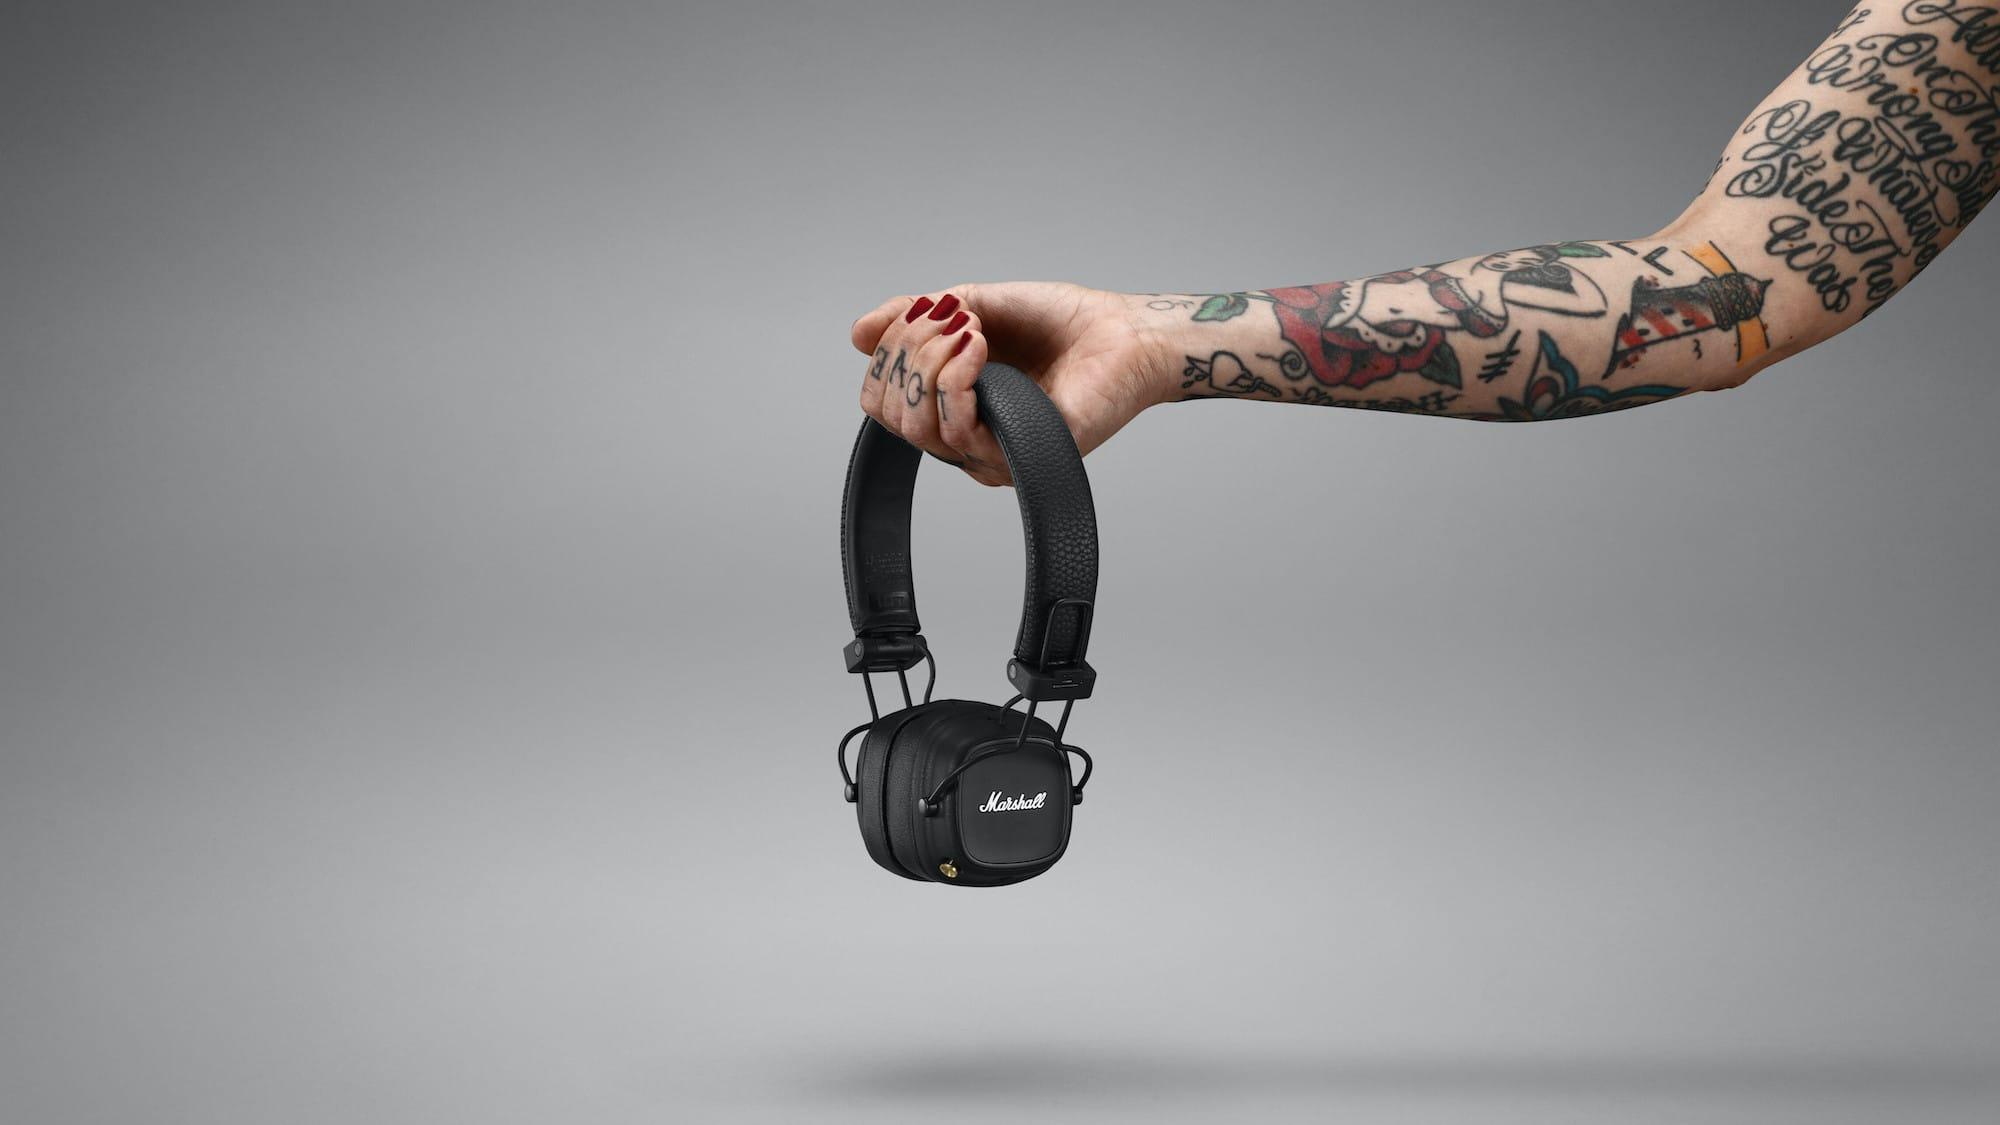 Marshall Major IV iconic headphones provide 80 hours of play